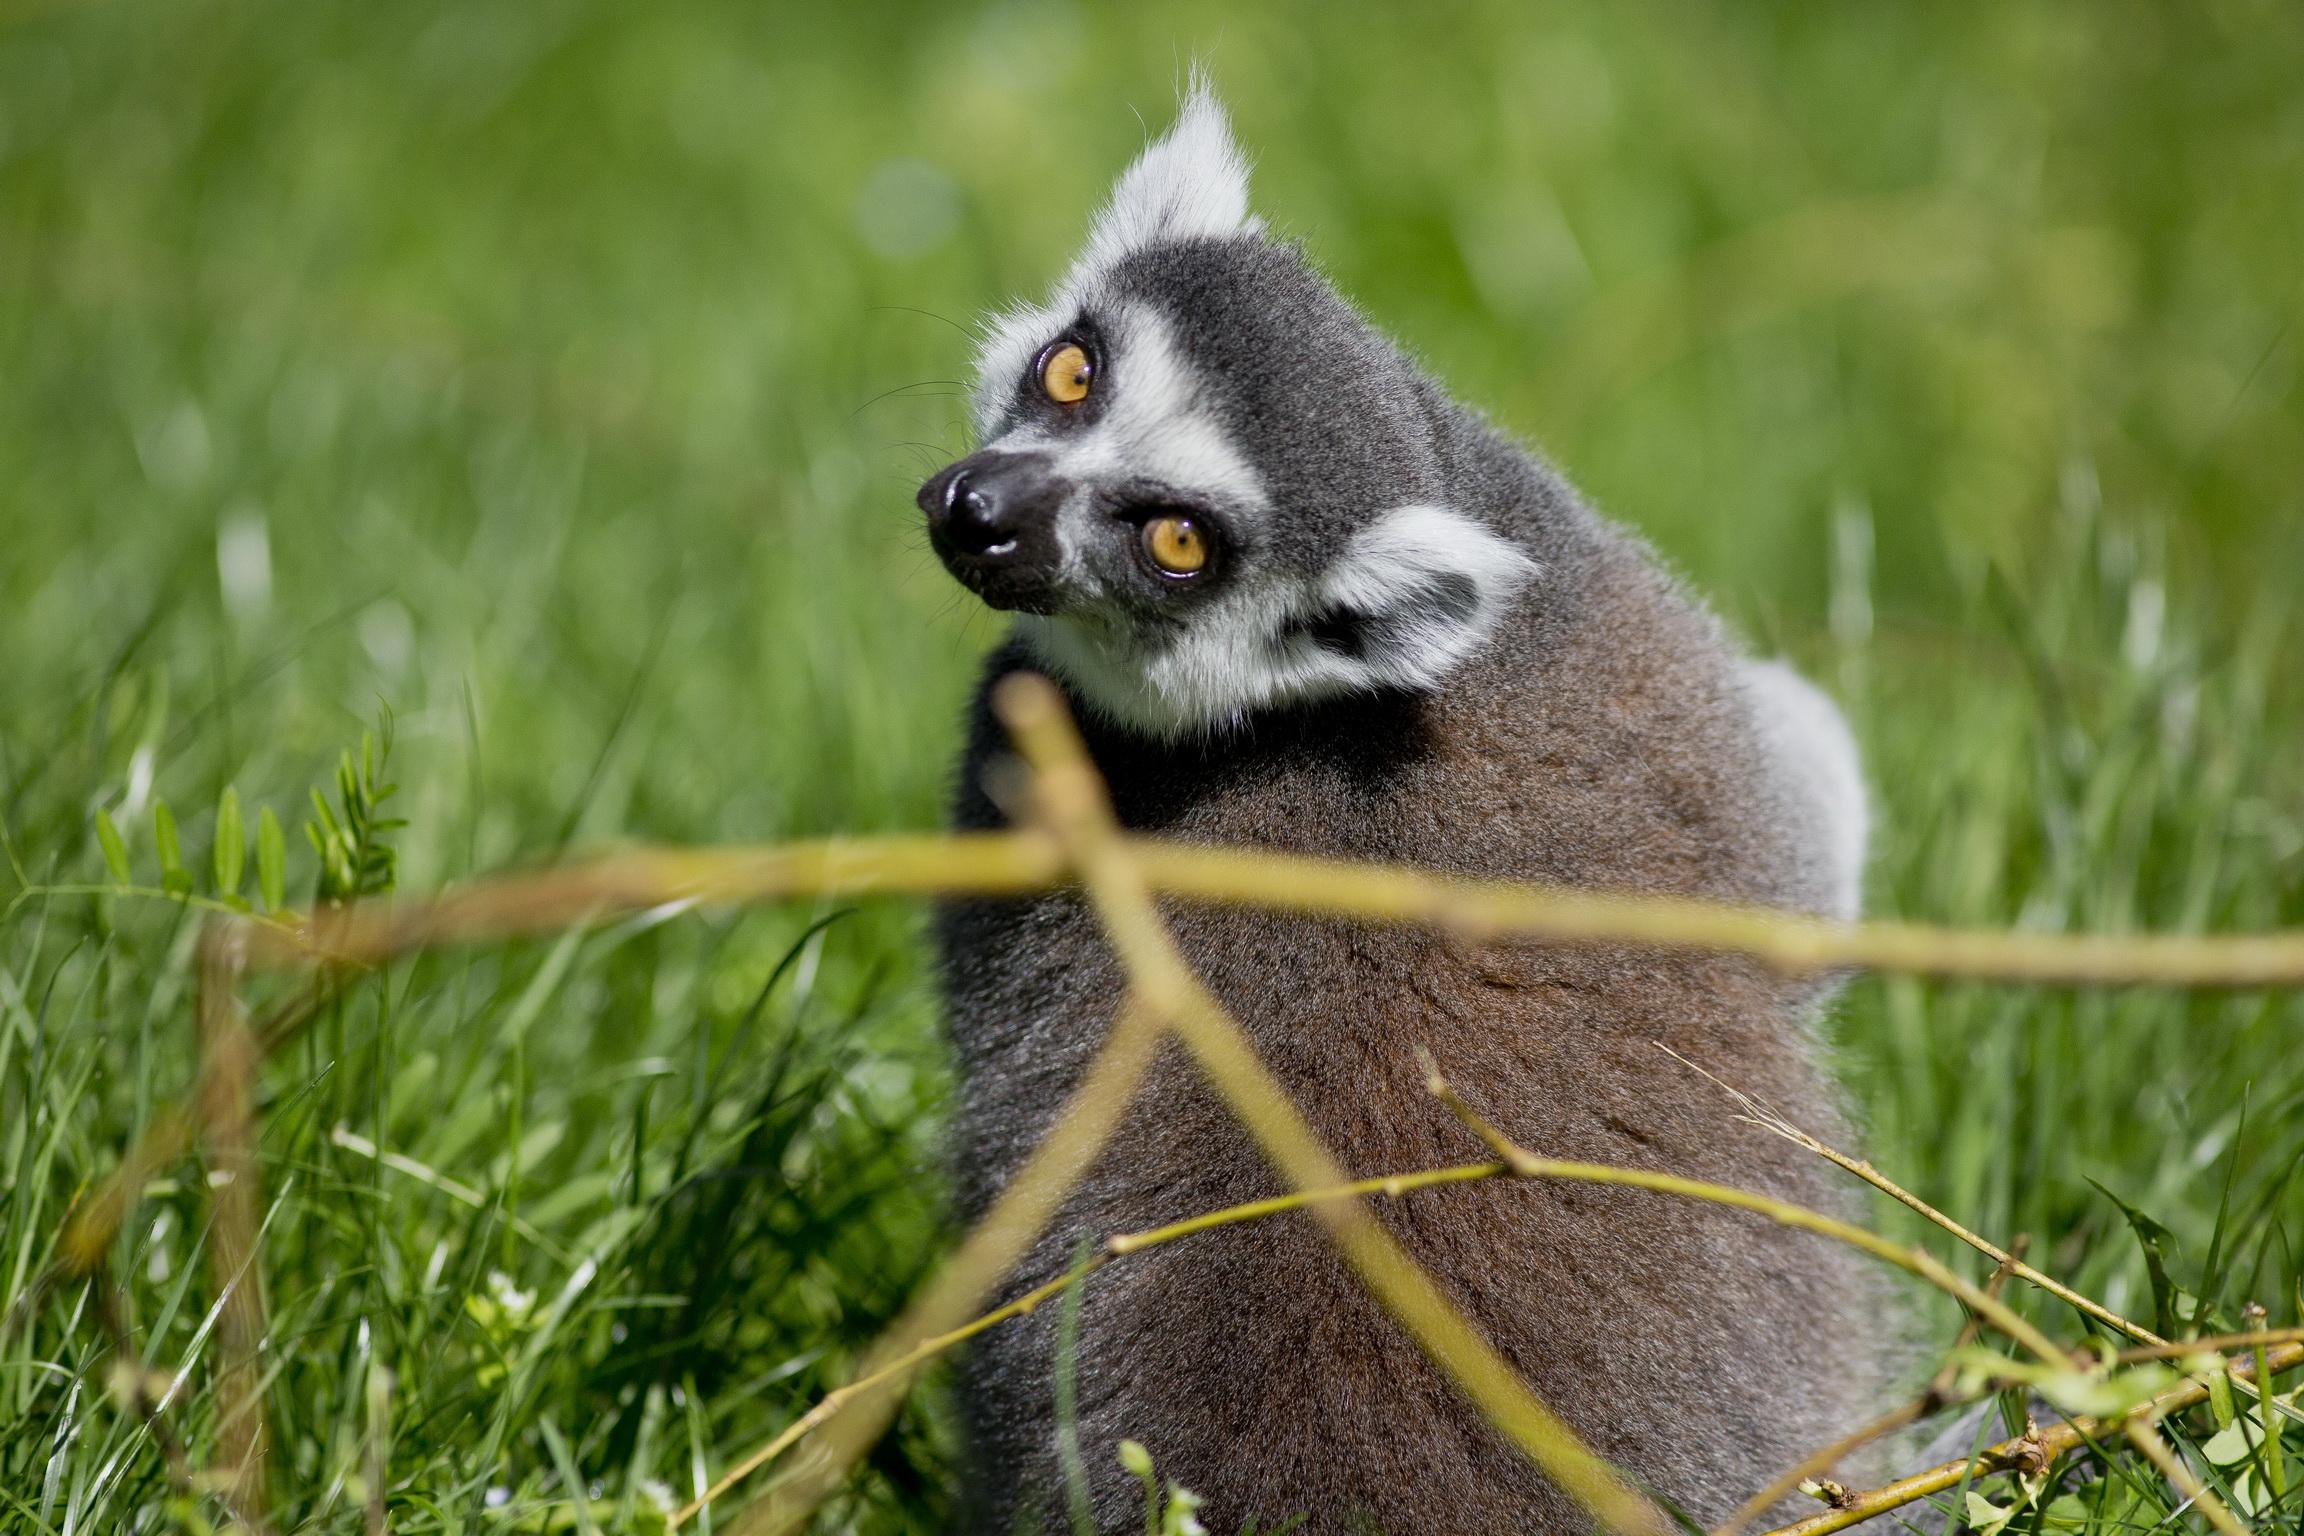 Prstenastorepa lemurica